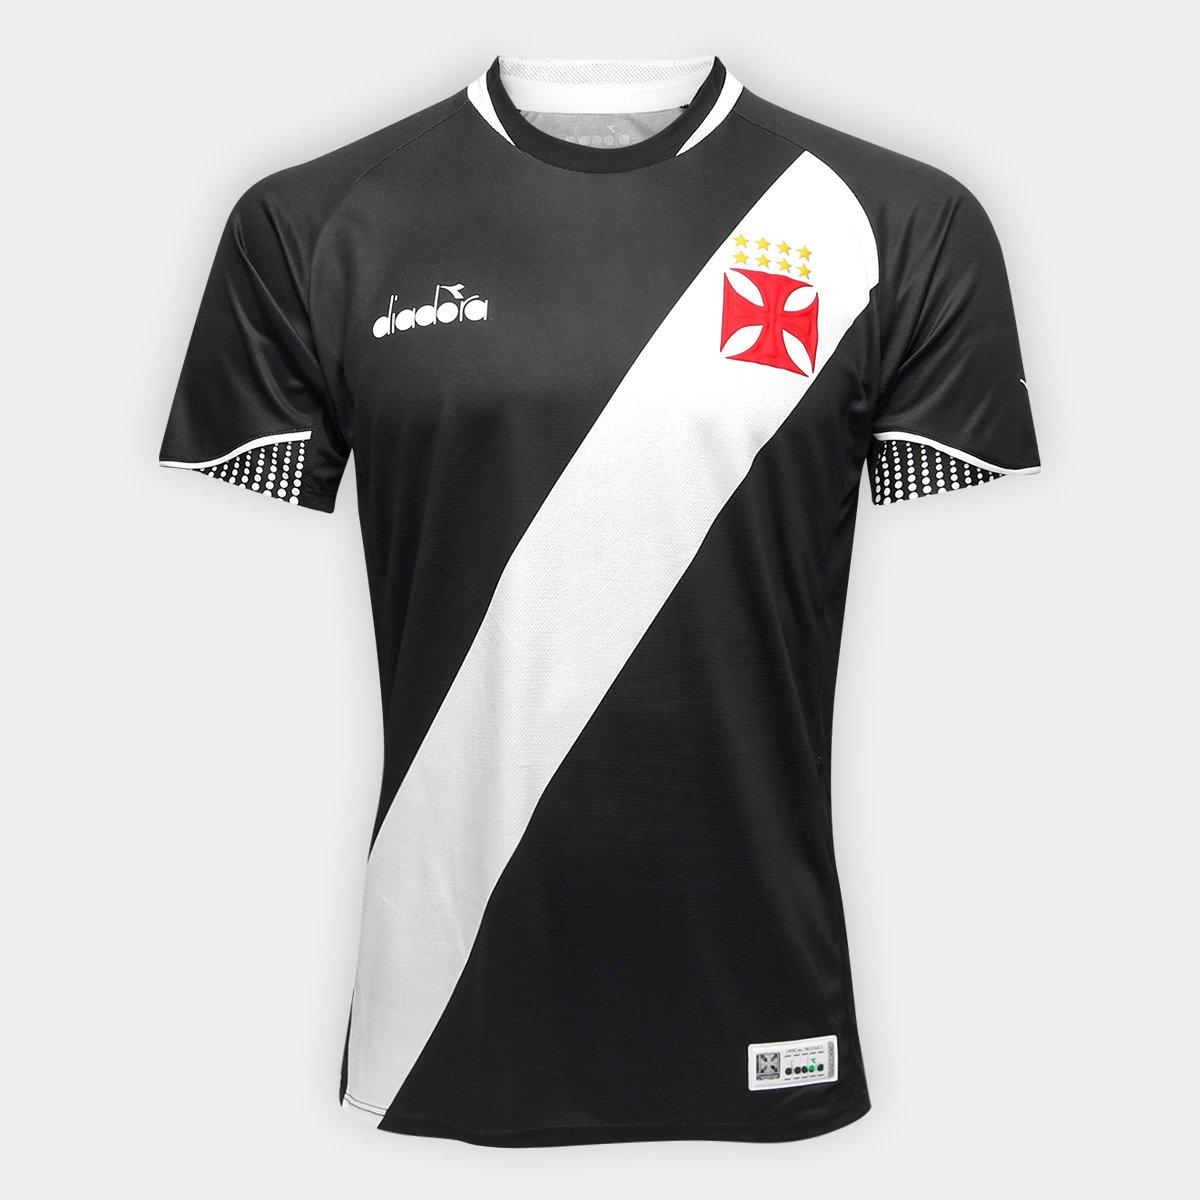 Camisa Vasco I 2018 s n° Jogador Diadora Masculina - Preto - Compre ... c0161a273b711